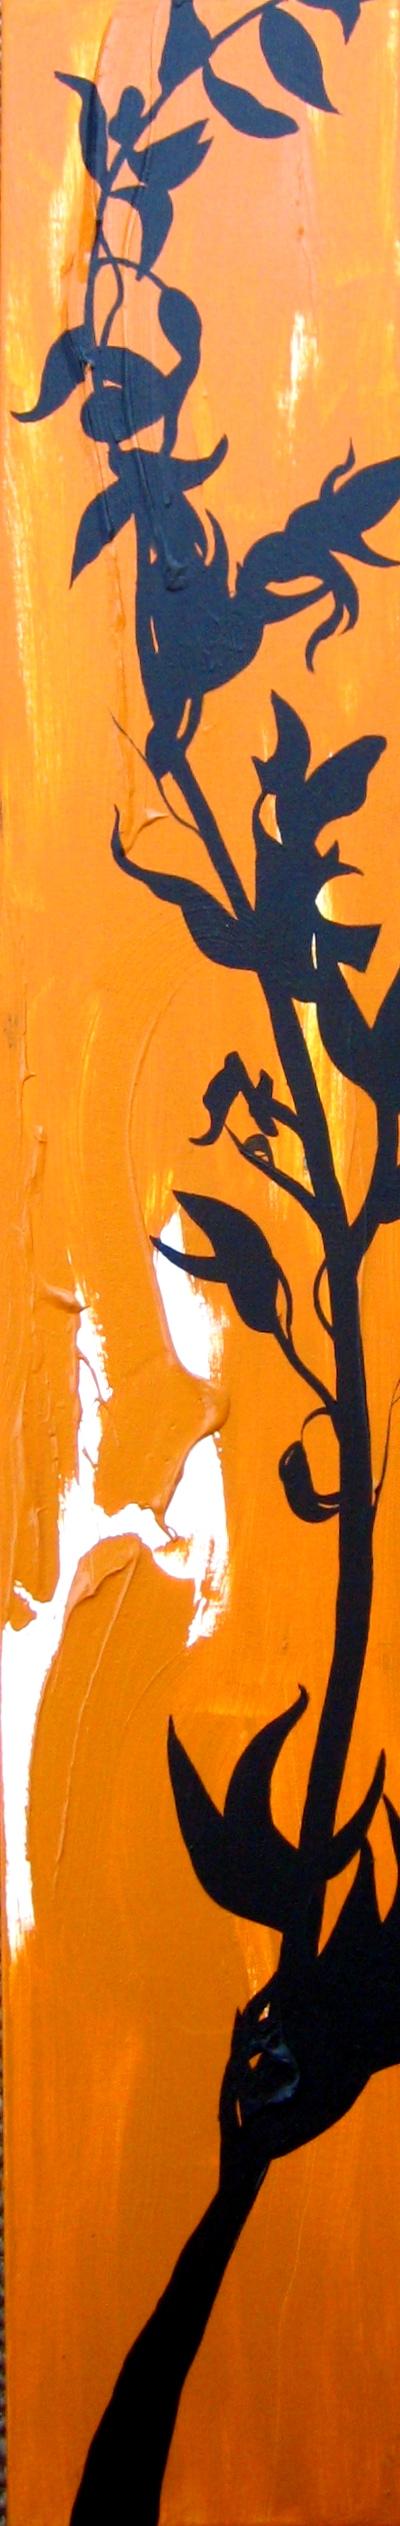 Acid Test Foliage